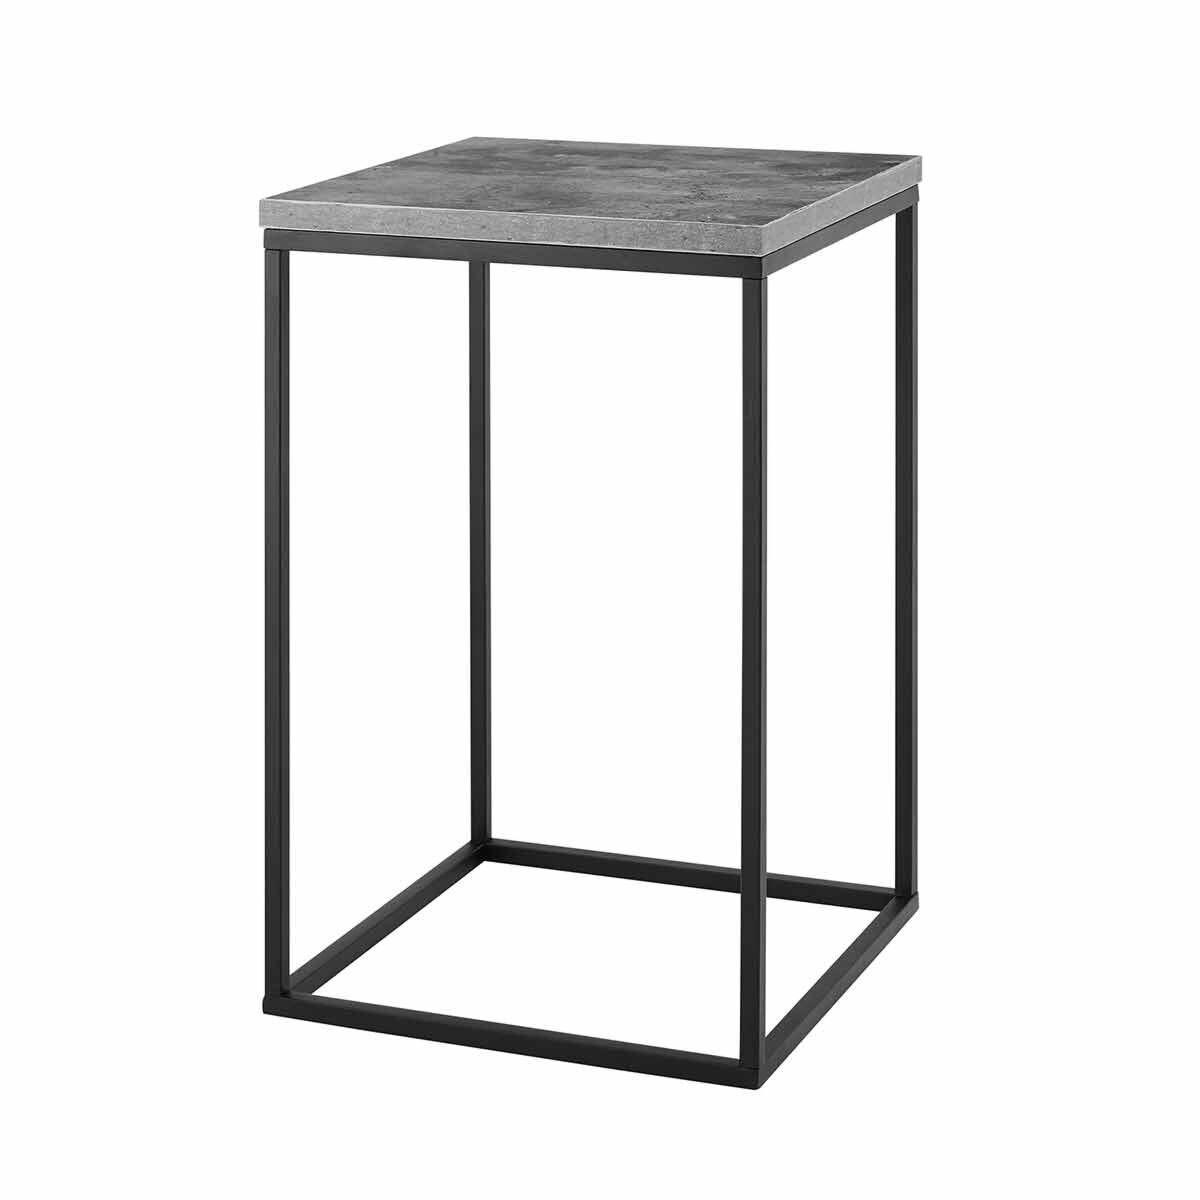 Huelva Modern Square Side Table Grey